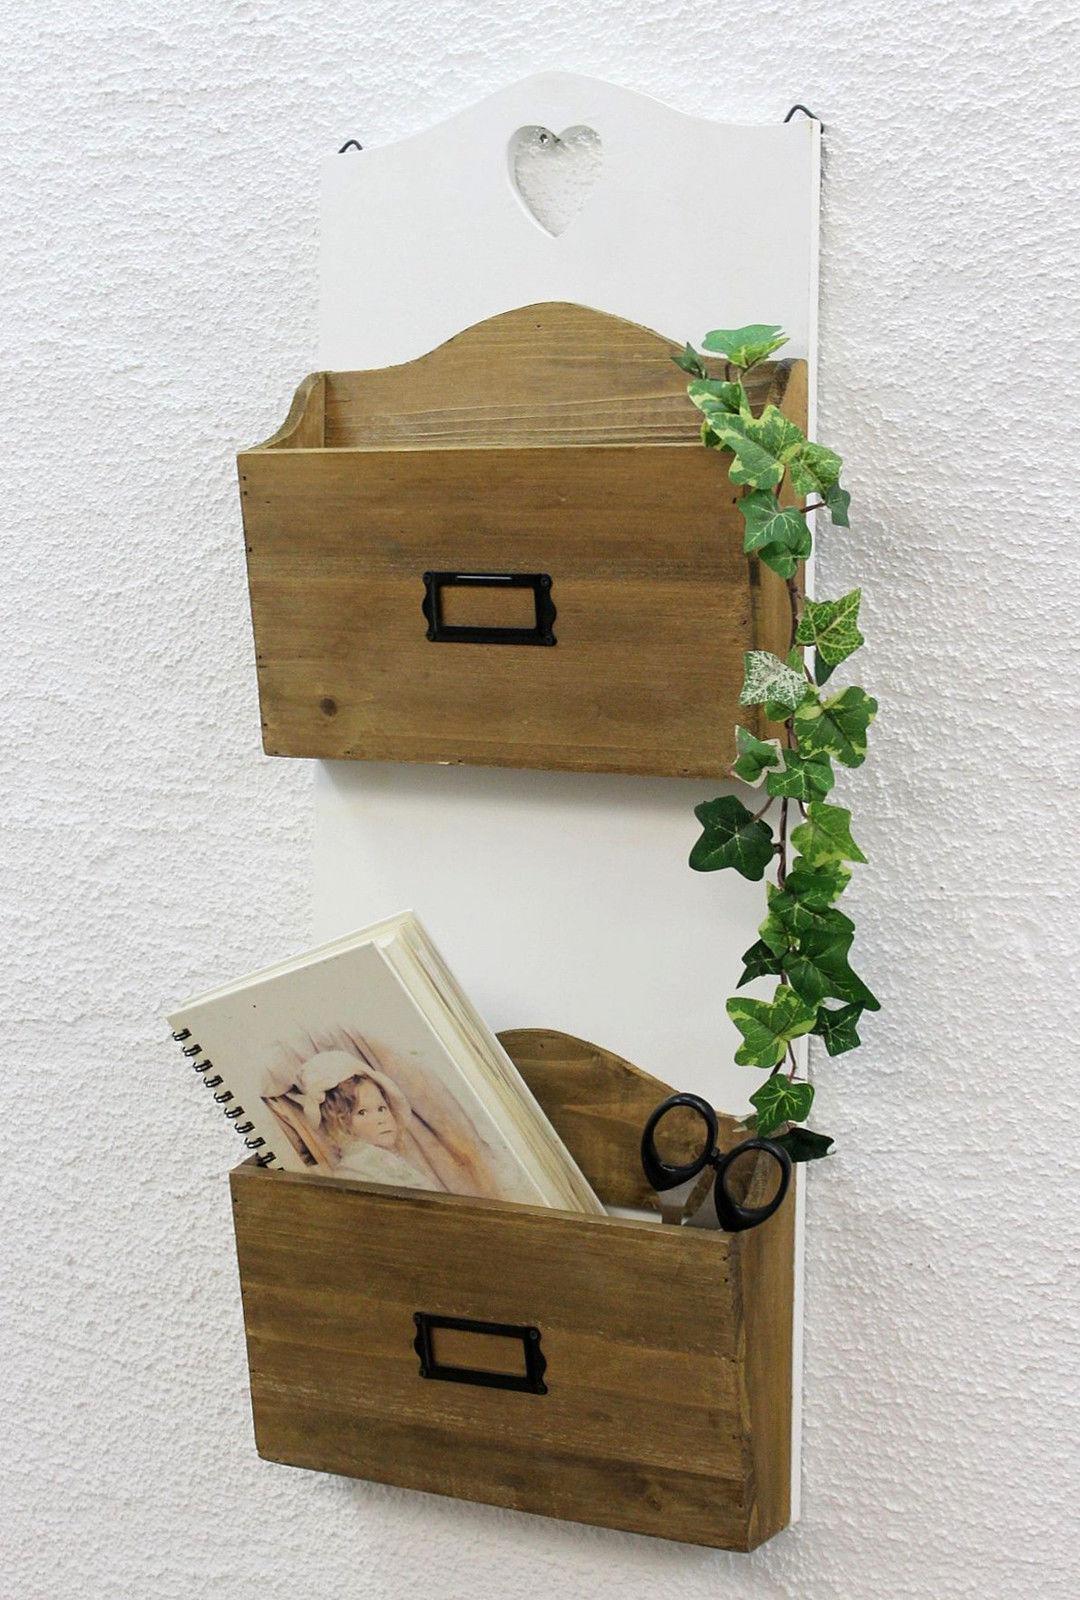 DanDiBo Shelf heart 12028 Shelf 60 cm Vintage Shabby Country house Kitchen shelf white